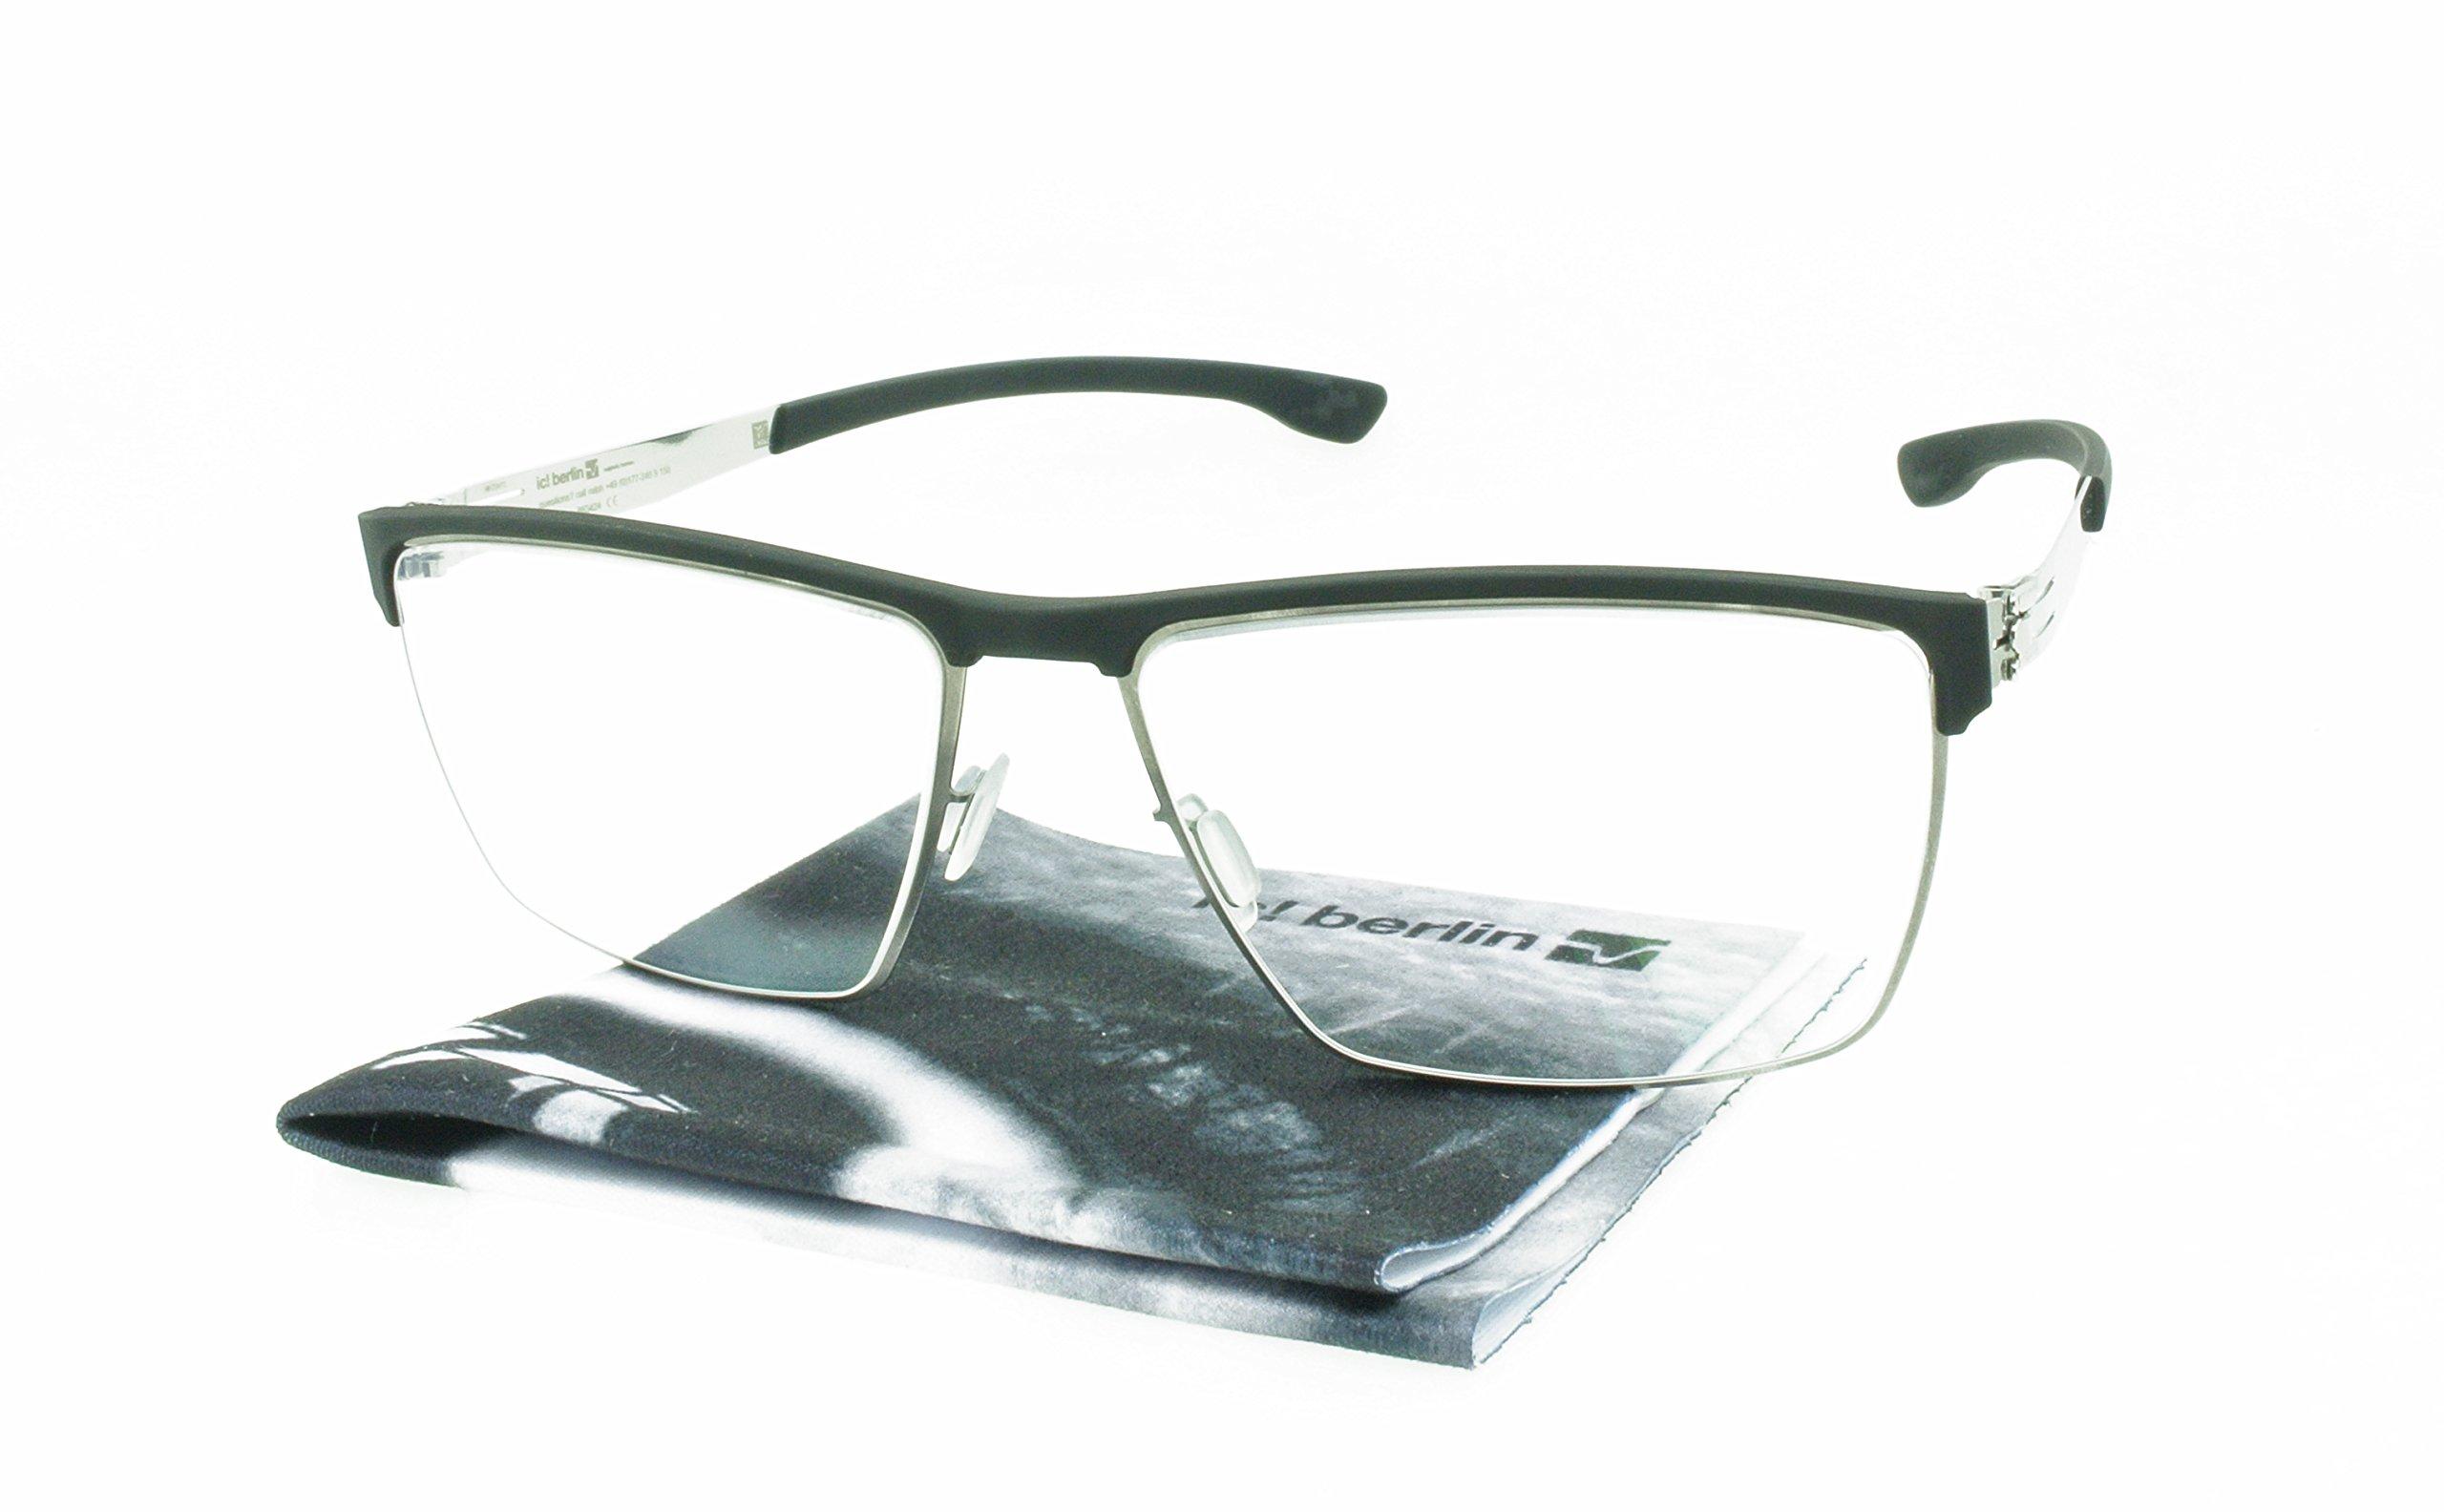 Brand New Authentic ic! berlin eyeglasses Tommy G. Rectangular Metal Frames (Chrome & Black)